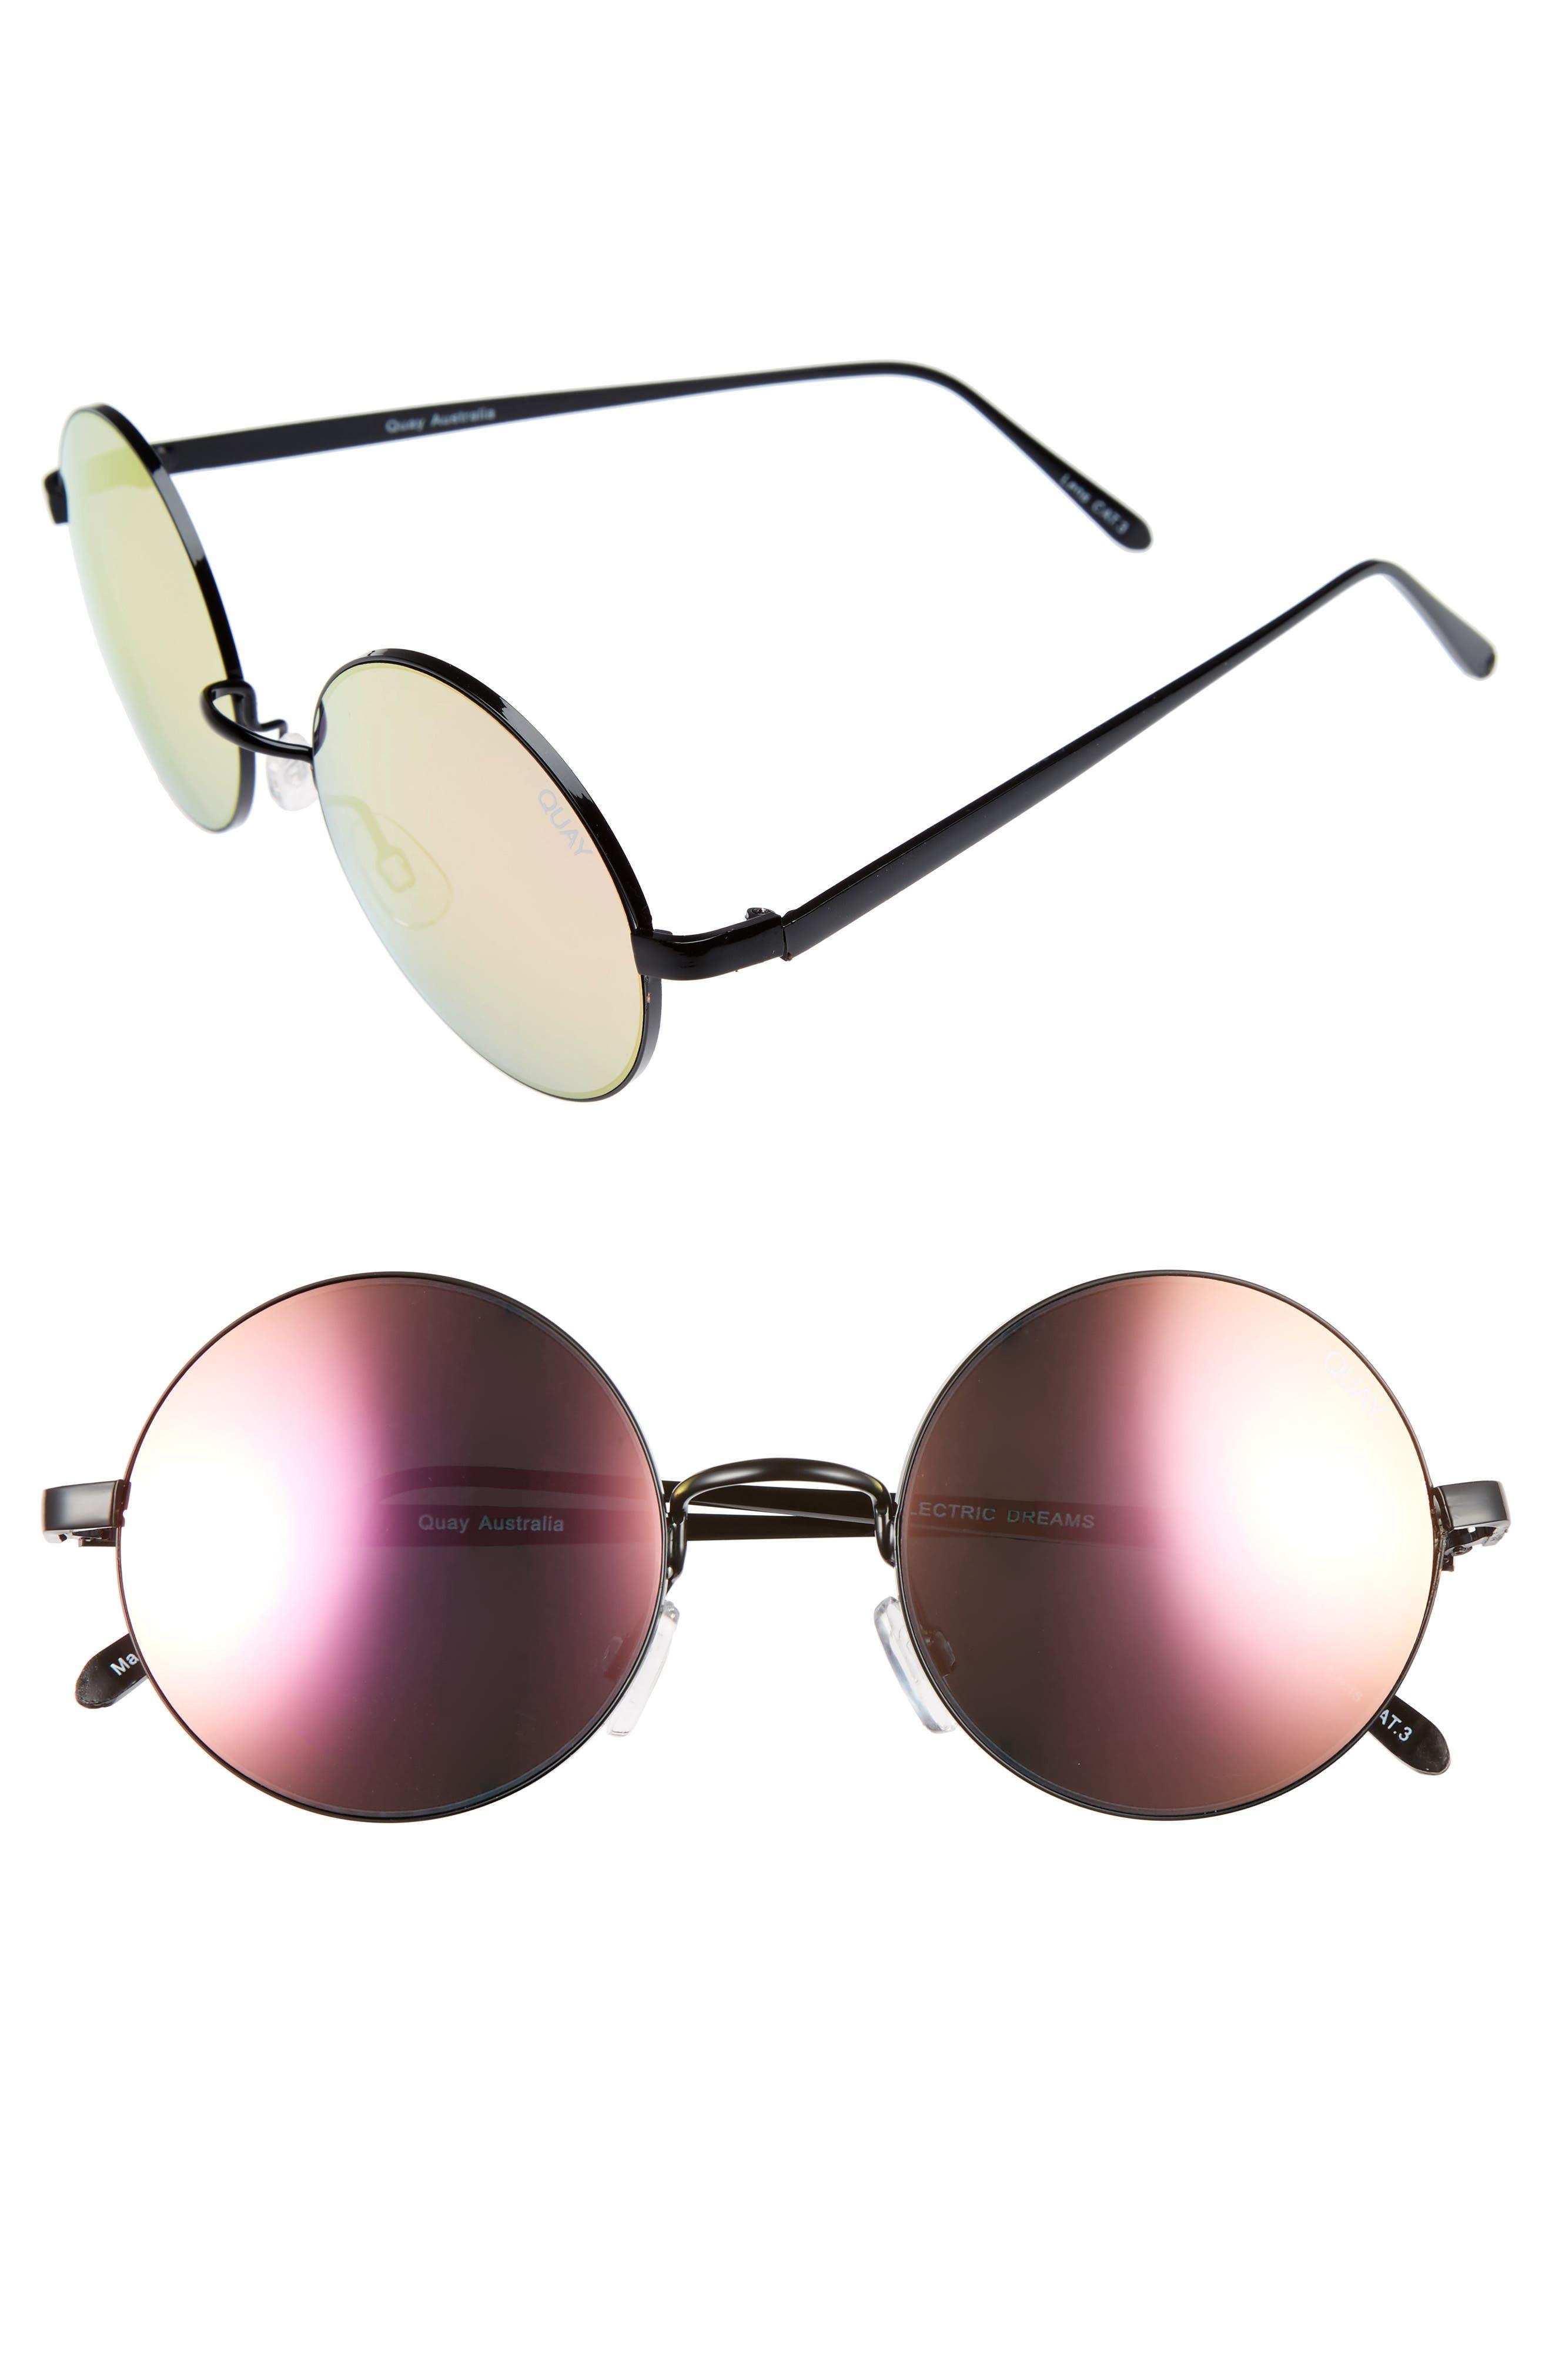 'Electric Dreams' 52mm Round Sunglasses,                         Main,                         color, 002